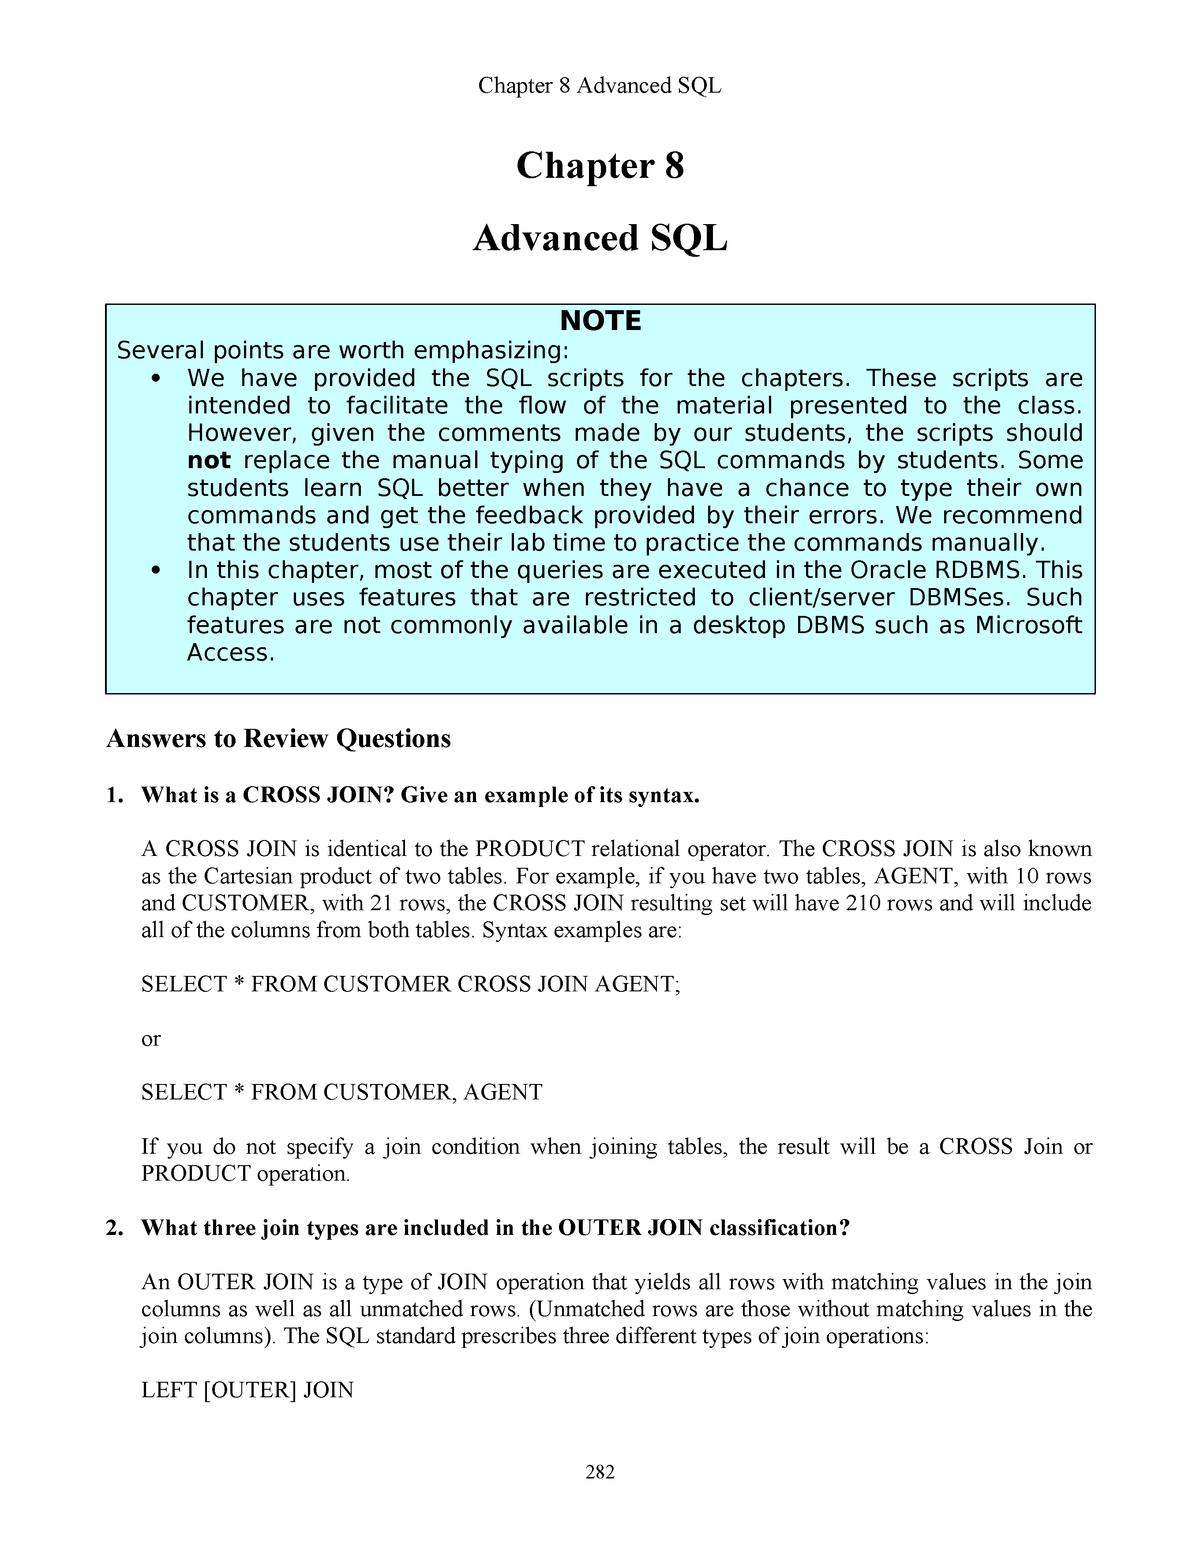 IM Ch08 Advanced SQL Ed10 - ITC423 Database Systems - CSU